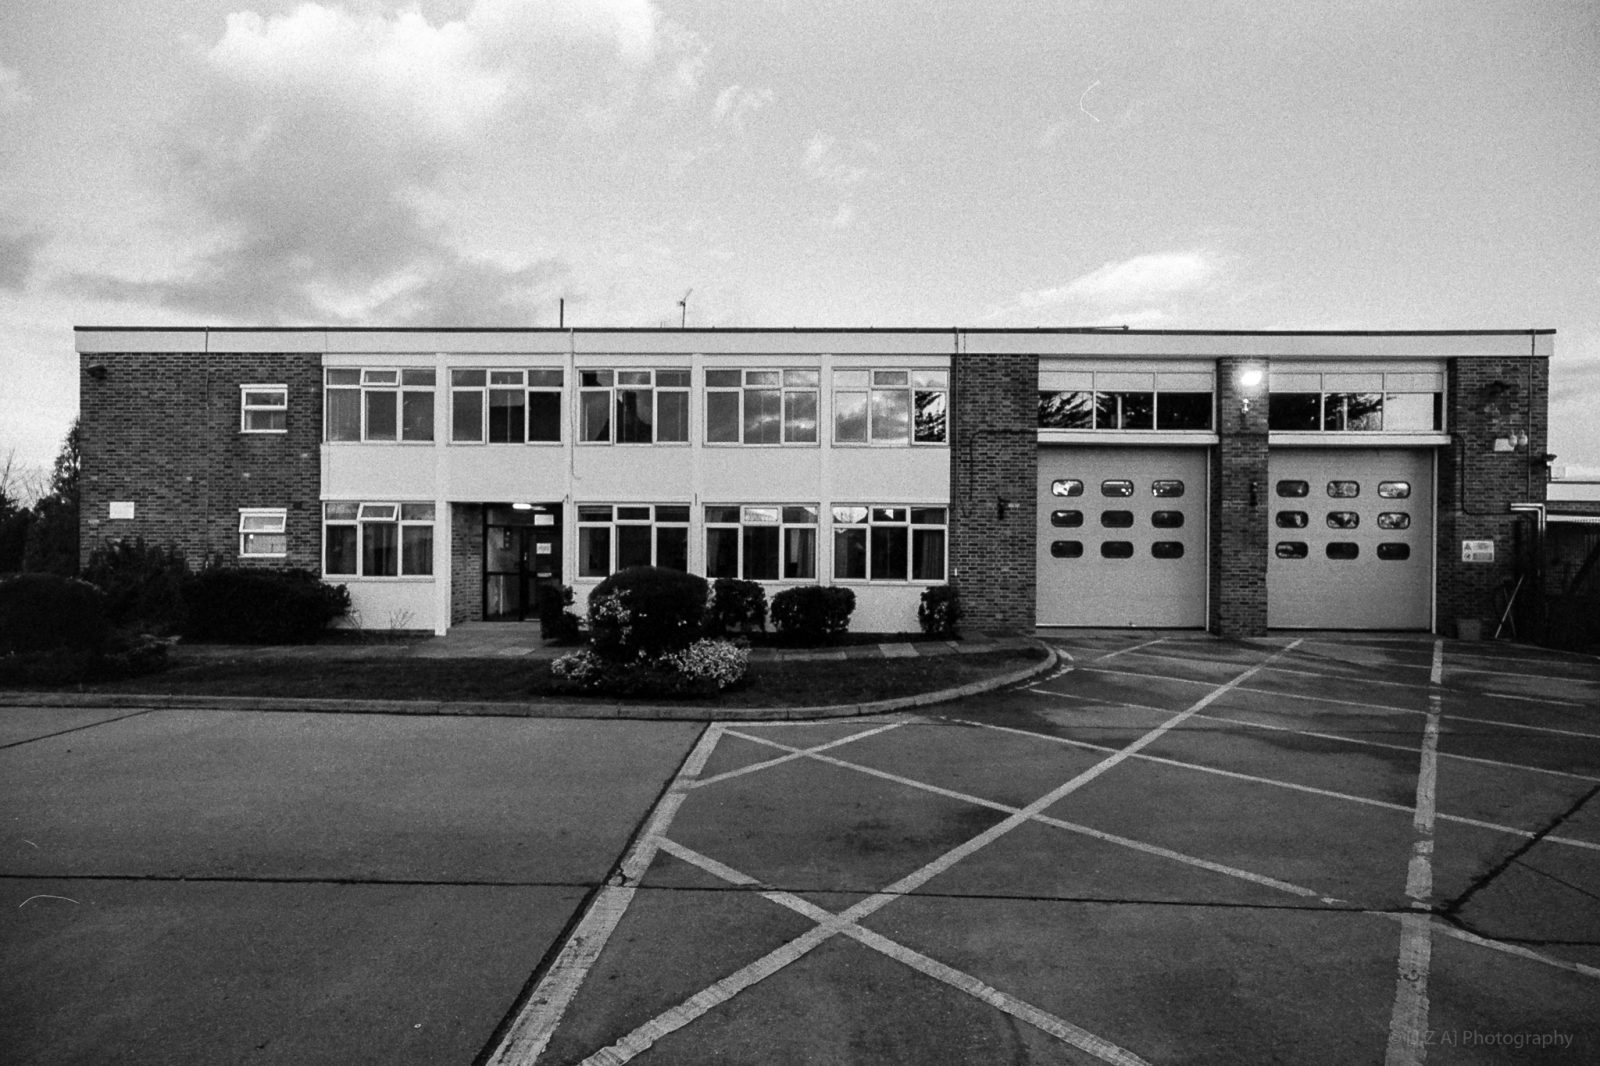 Wennington Fire Station